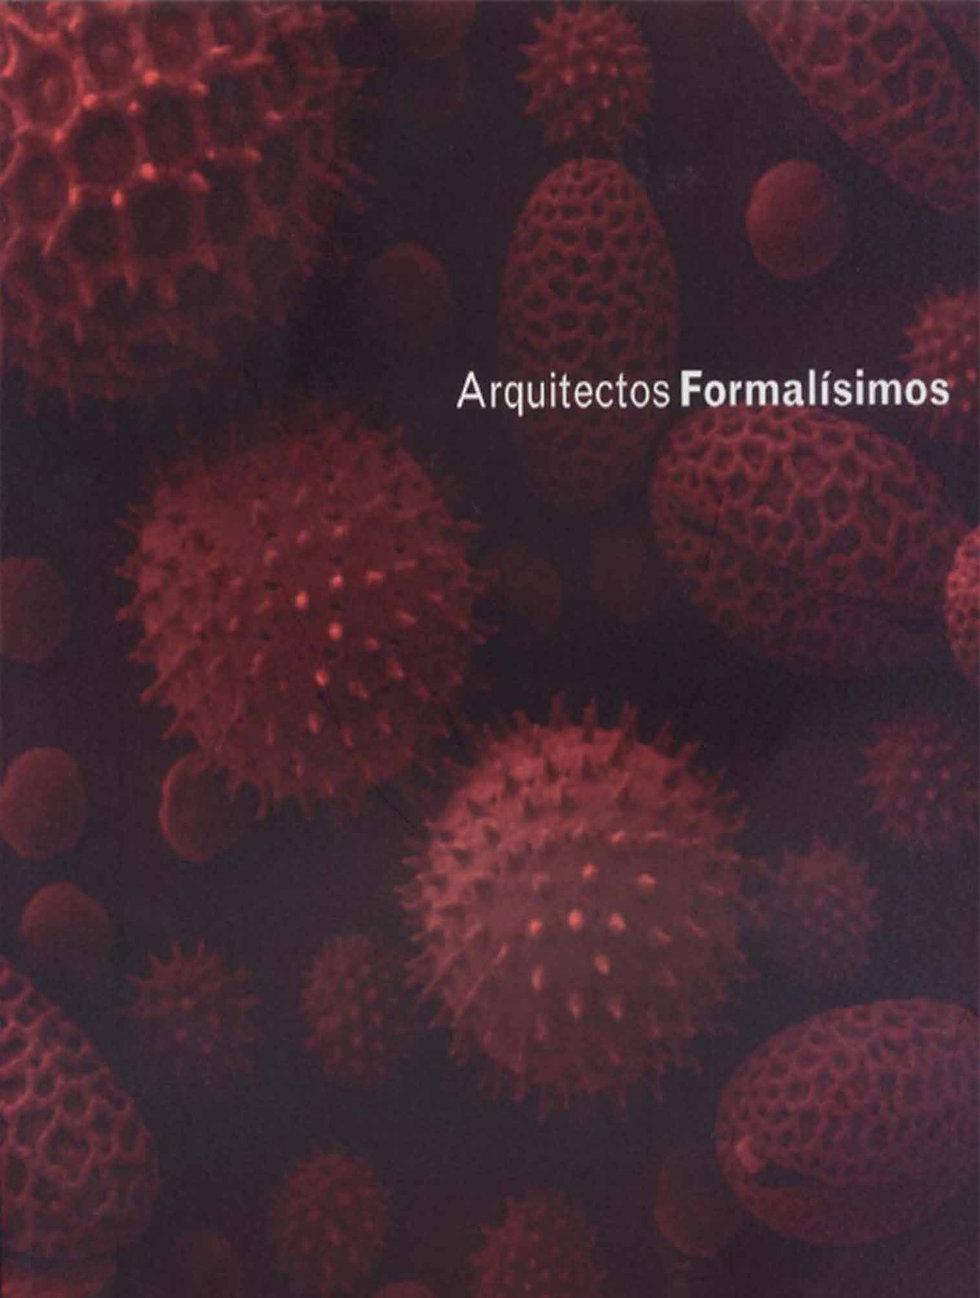 ENSAMBLE STUDIO ARQUITECTOS FORMALISIMOS THE TRUFFLE